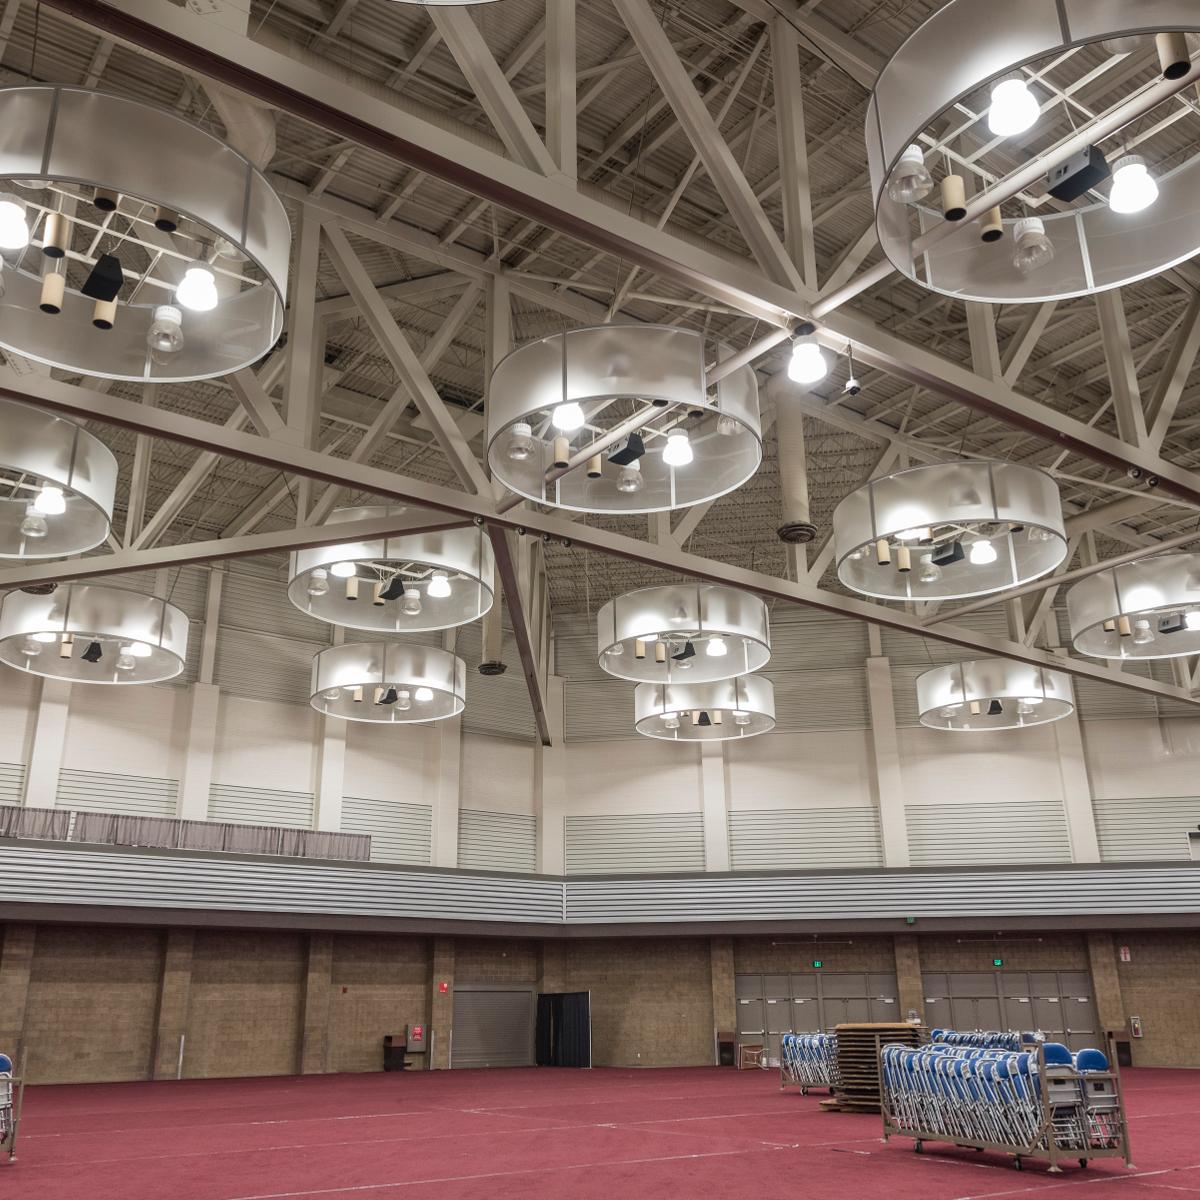 Allen County War Memorial Coliseum Expo Center  LA